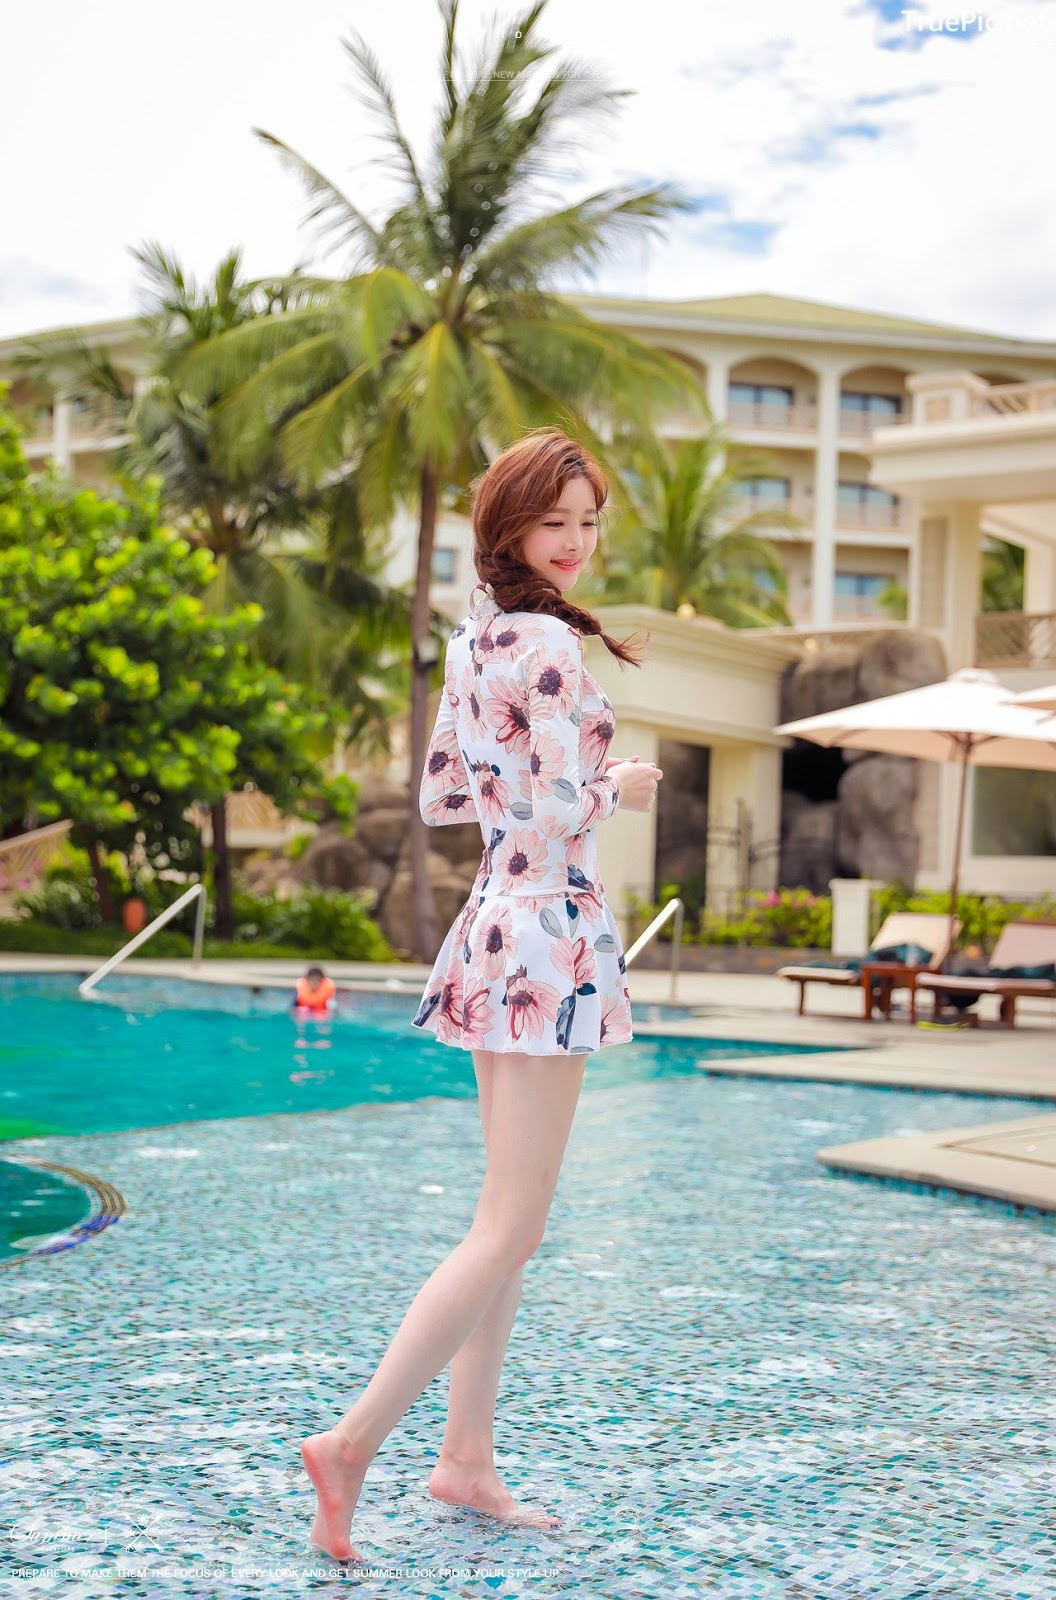 Image Korean Fashion Model - Kim Hee Jeong - Pink Fantasy Flamingo Swimsuit - TruePic.net - Picture-5